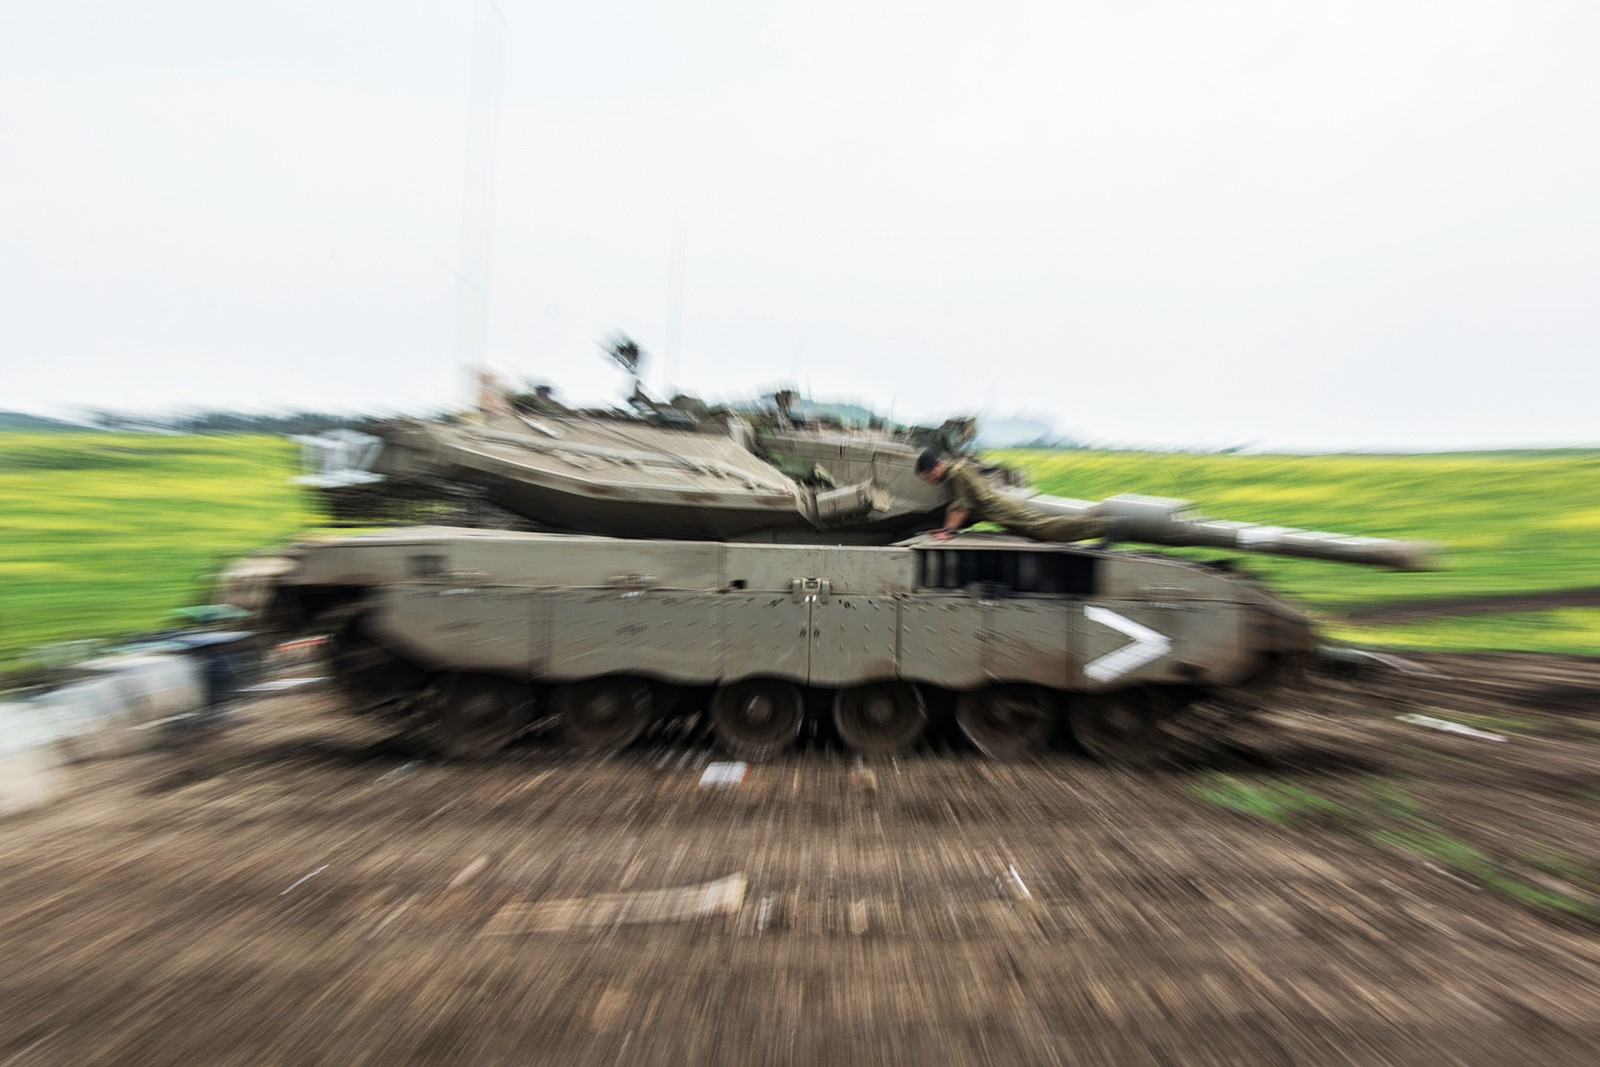 Golan 고원에서 훈련중인 이스라엘육군 Merkava..